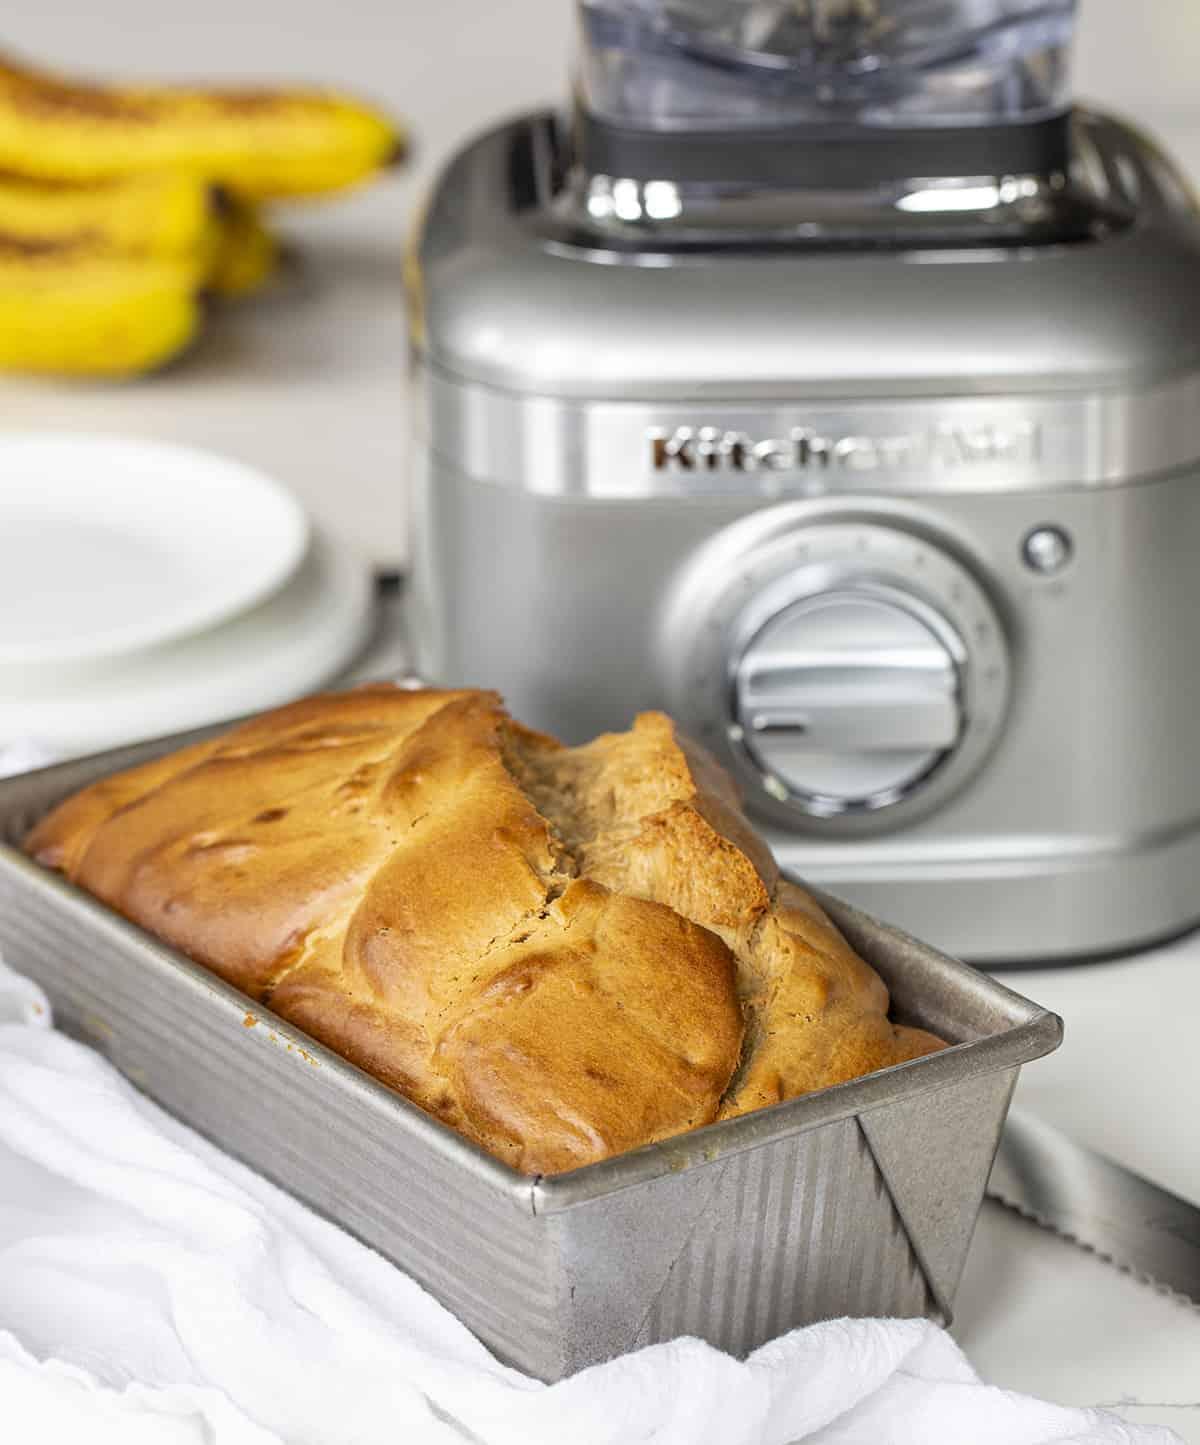 https://iambaker.net/wp-content/uploads/2020/05/peanut-butter-bread.jpg